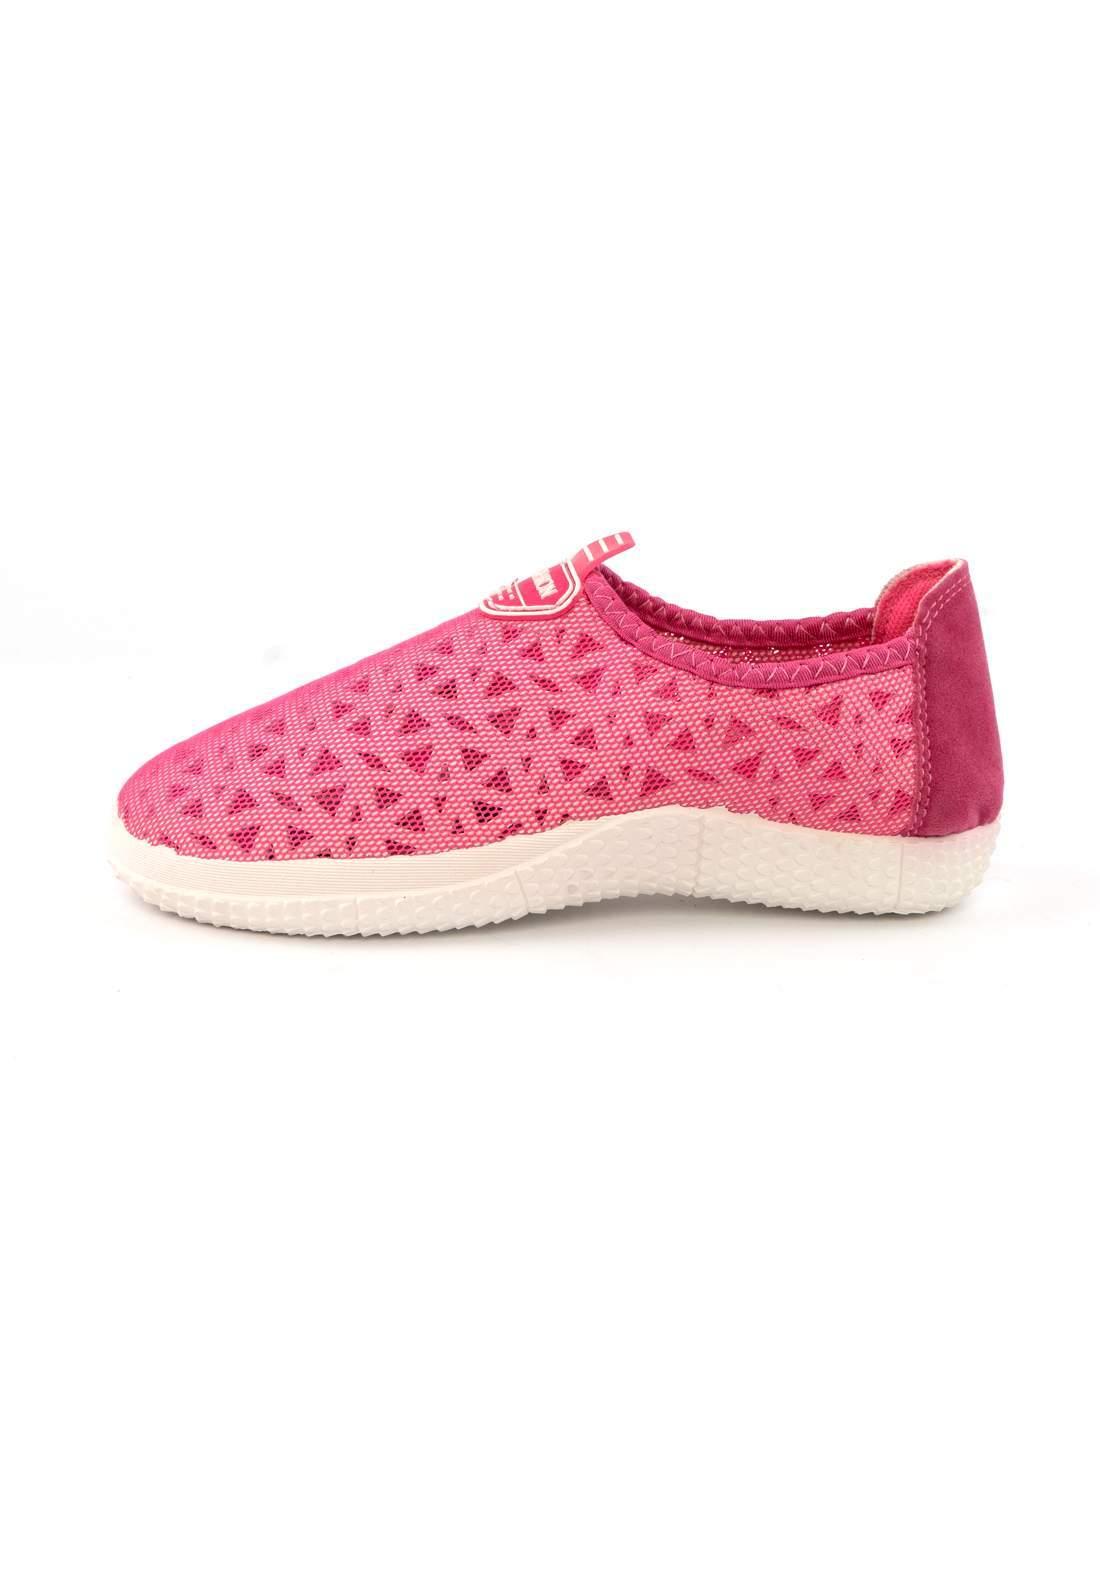 حذاء نسائي رياضي قماش وردي اللون